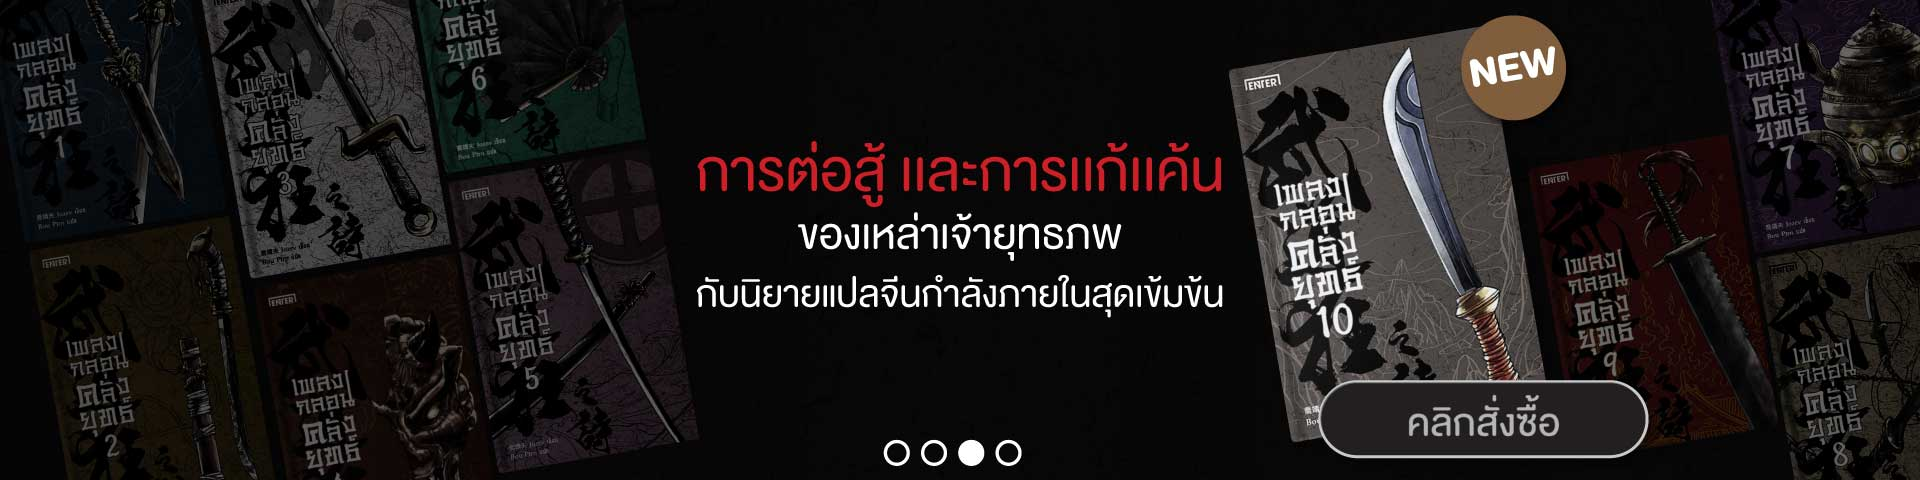 Banner_All_เพลงกลอนคลั่งยุทธ์8_EX